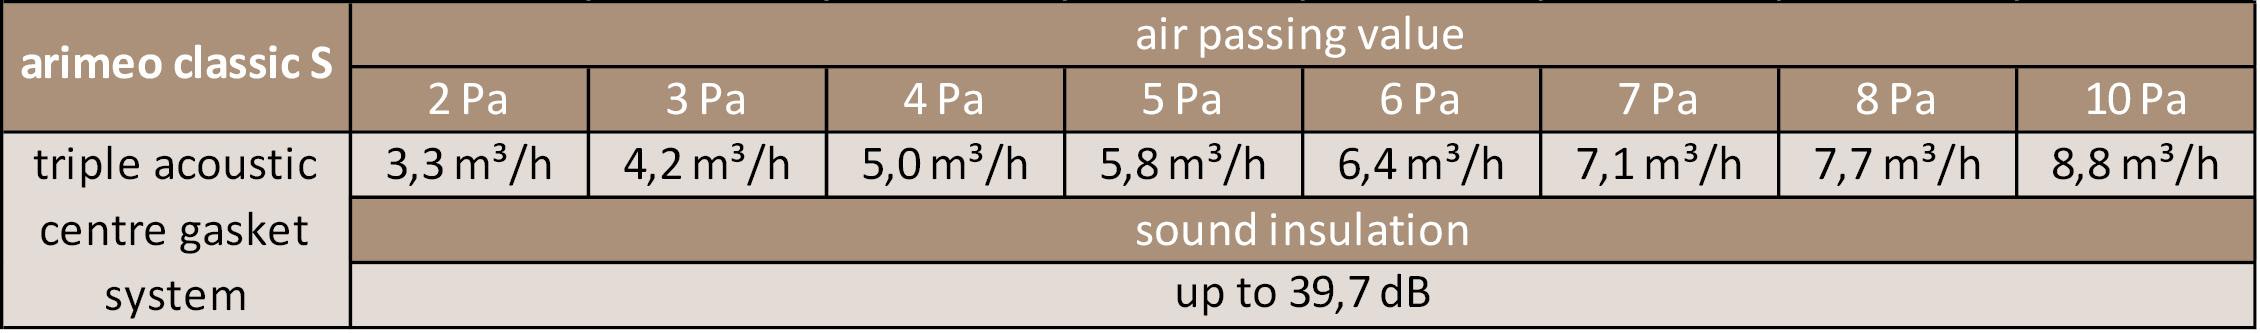 arimeo classic S performance data triple acoustic centre gasket system